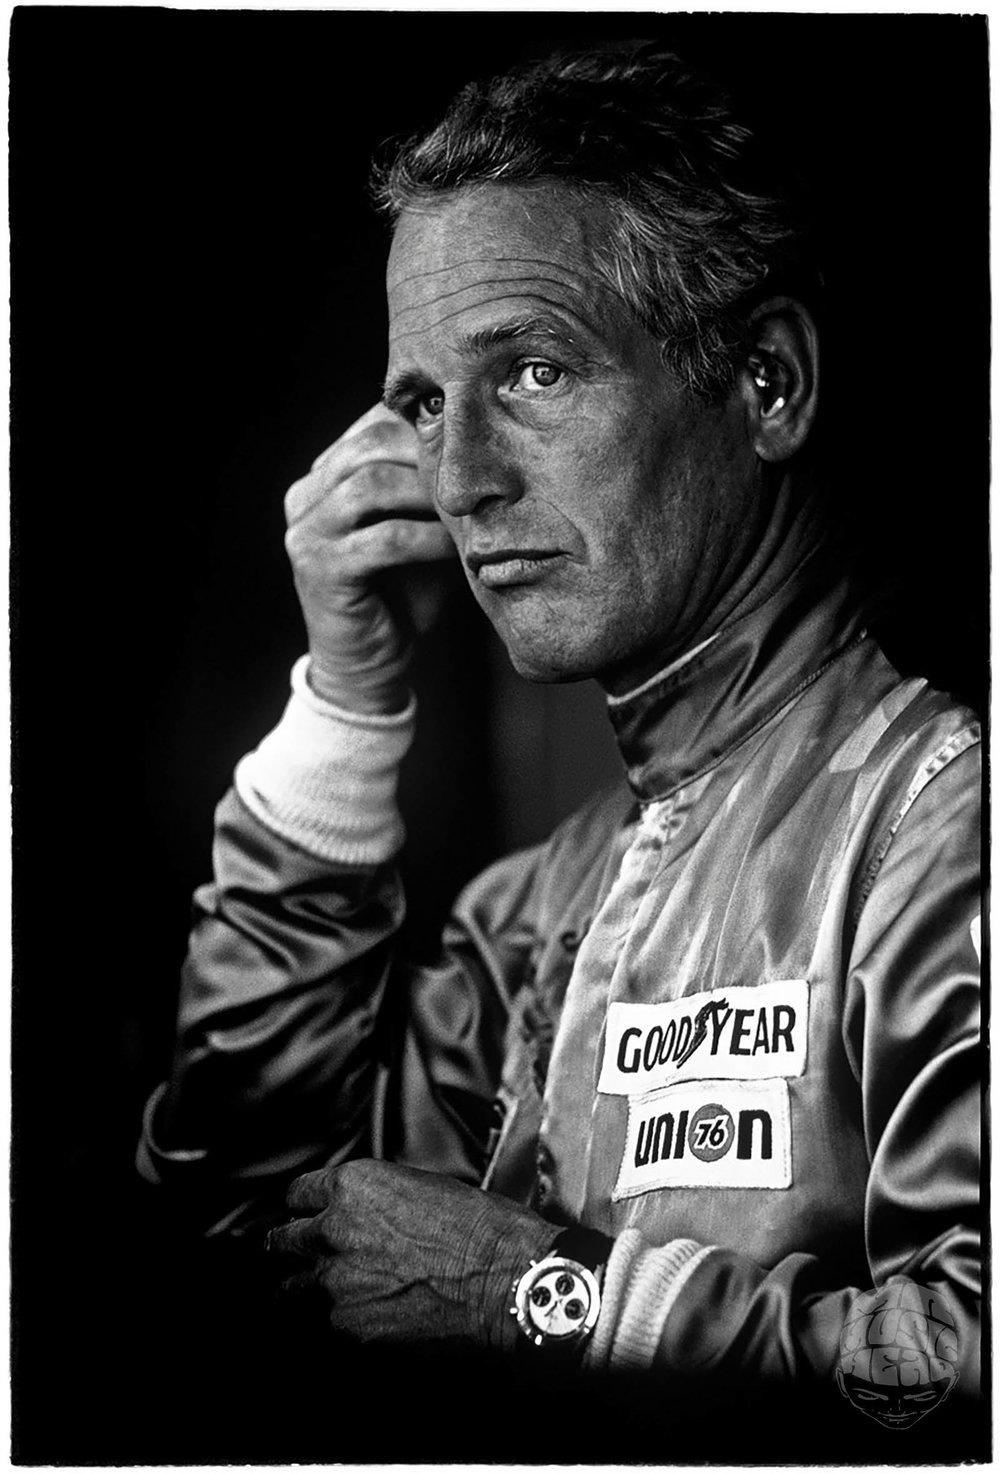 al satterwhite_Paul Newman.jpg